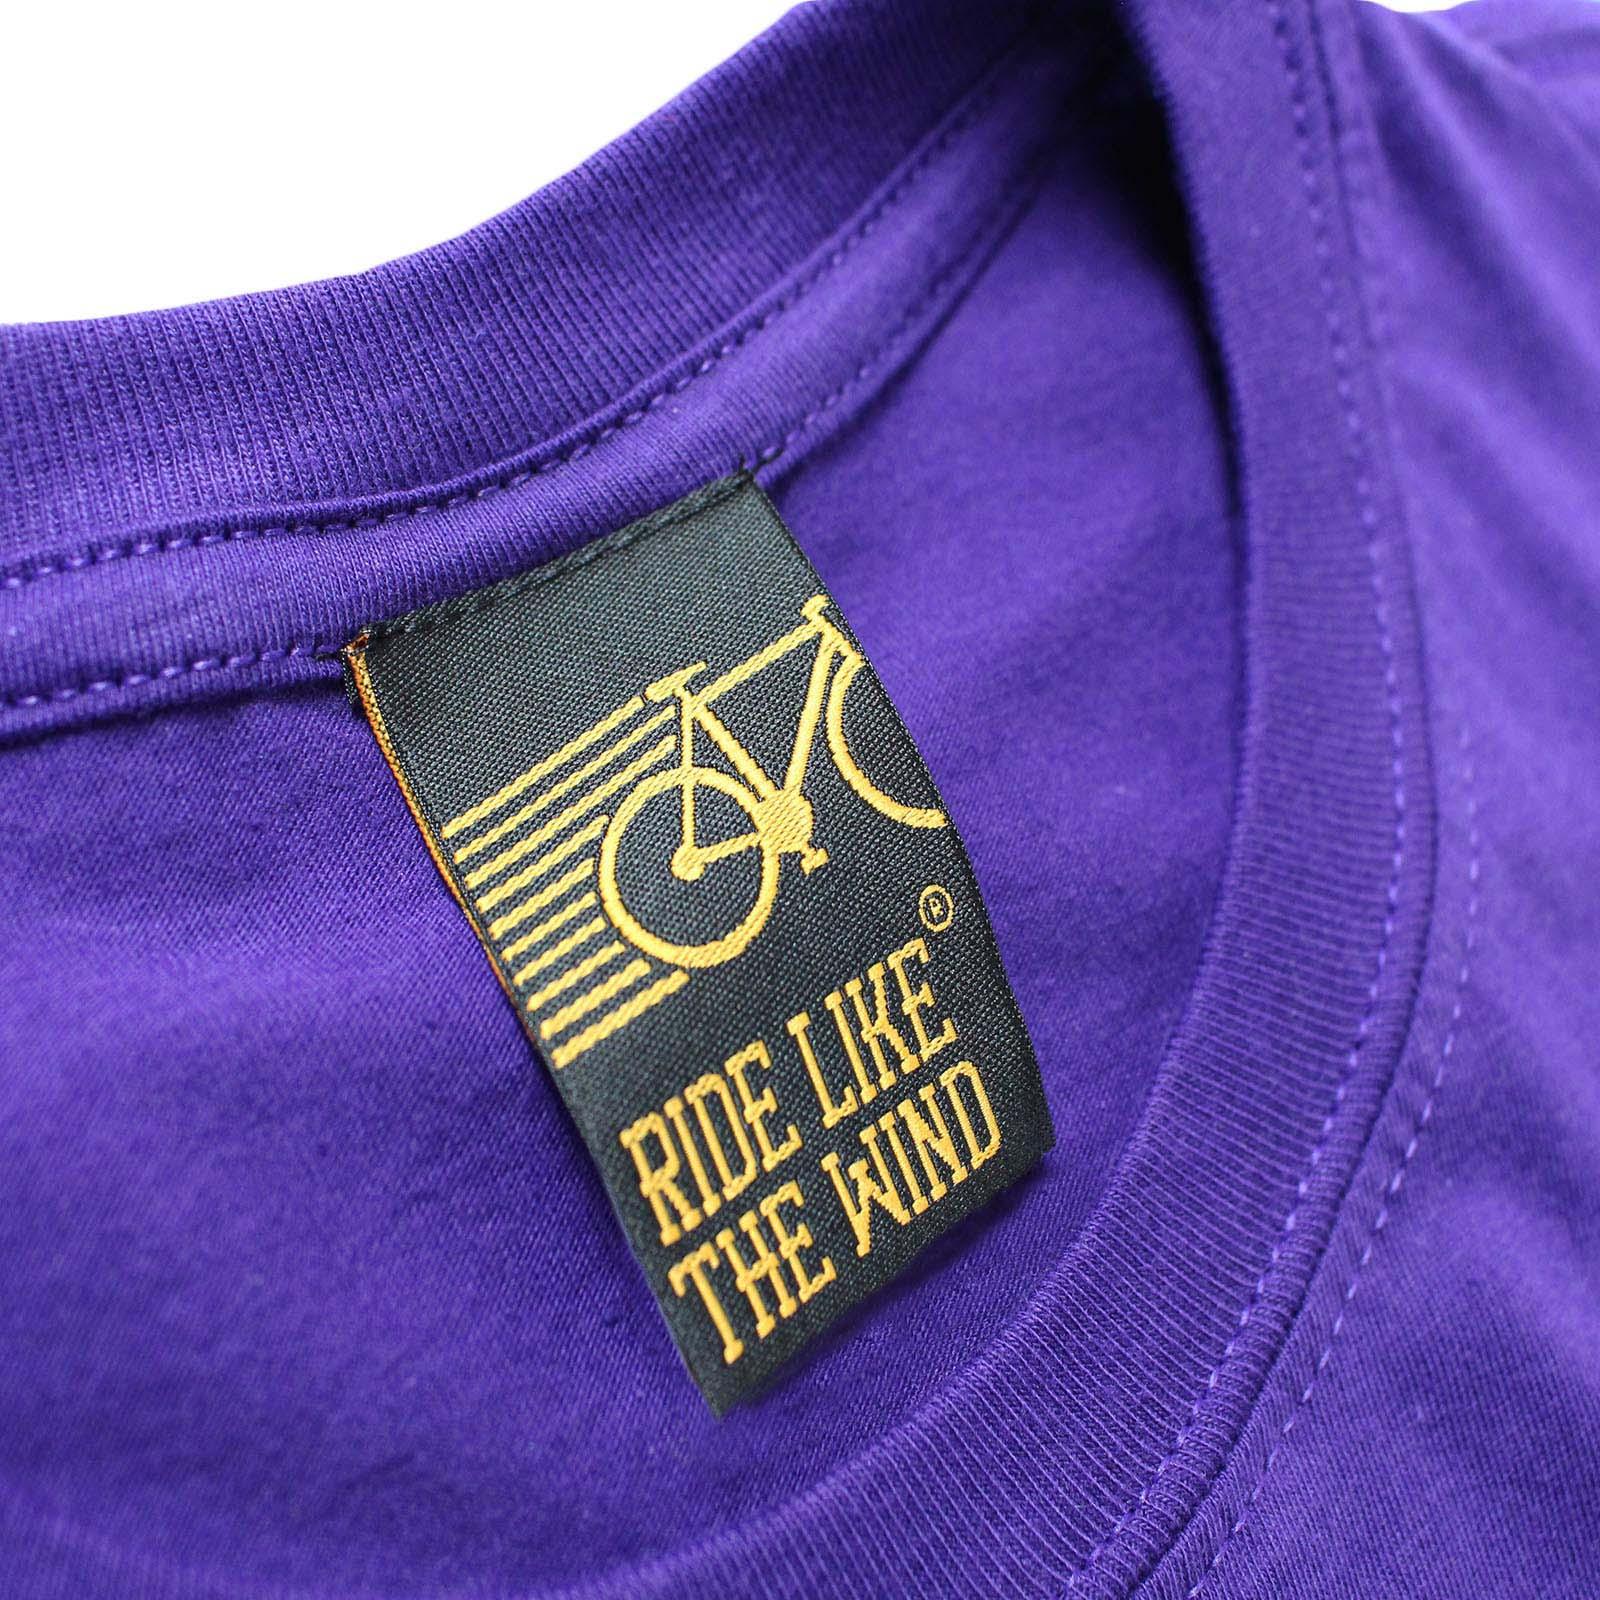 Cycling-Yeah-My-Bike-Did-Cost-More-funny-top-Birthday-tee-T-SHIRT-T-SHIRT thumbnail 24